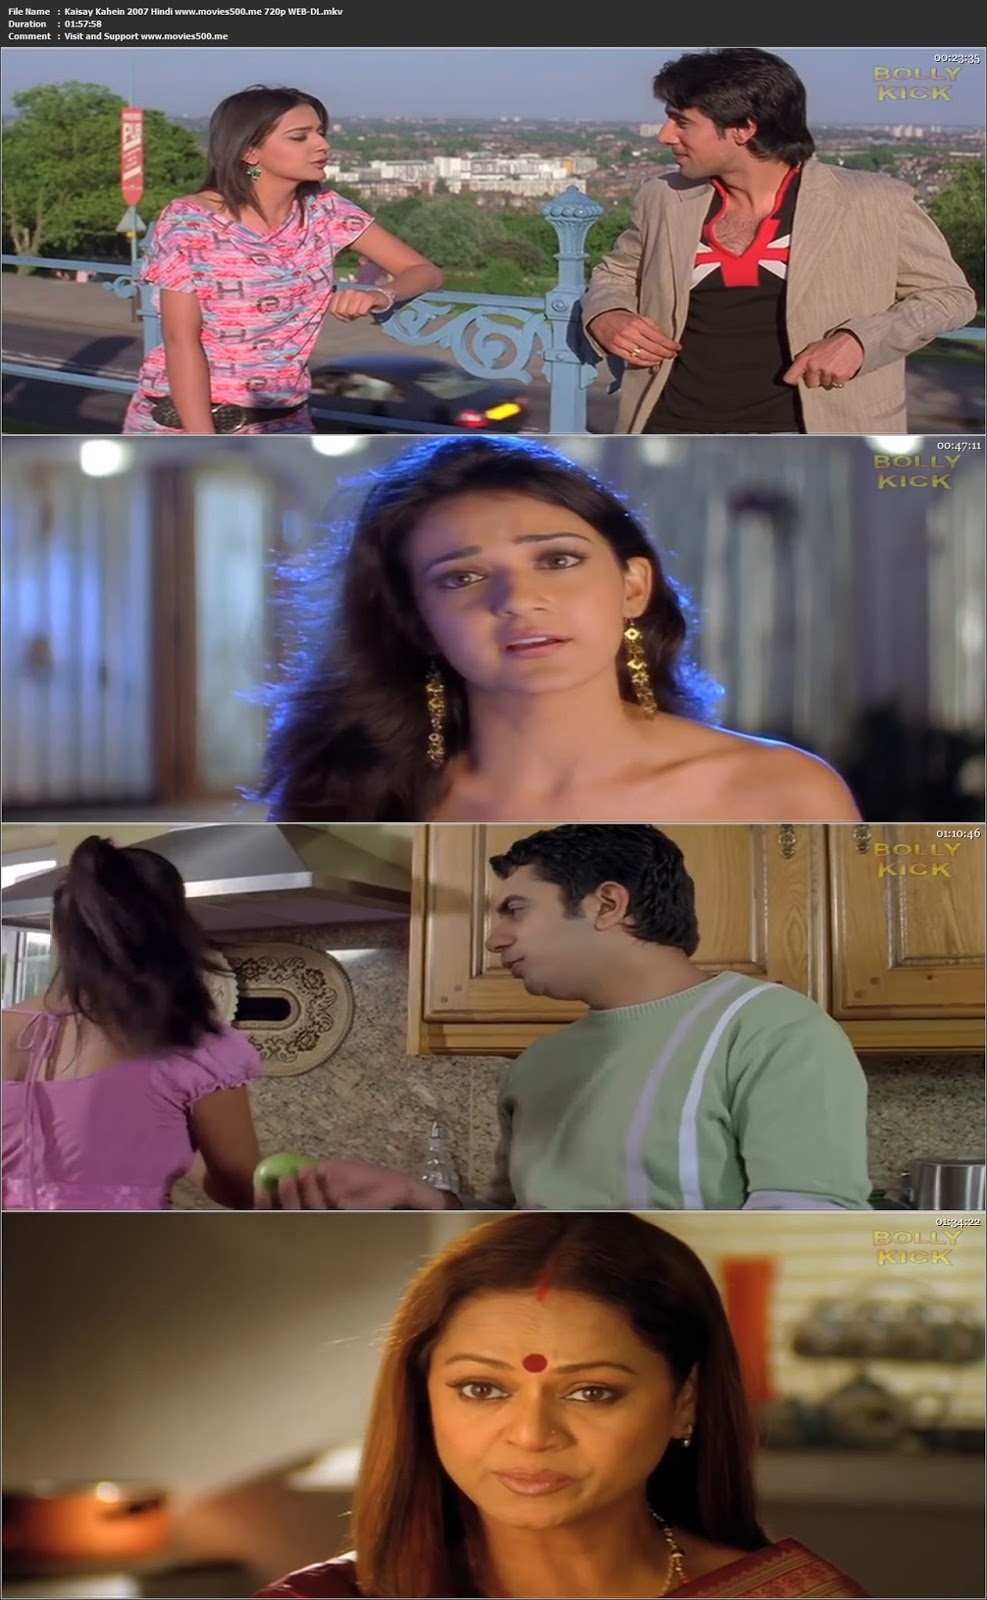 Kaisay Kahein 2007 Hindi Full Movie WEB DL 720p at movies500.site